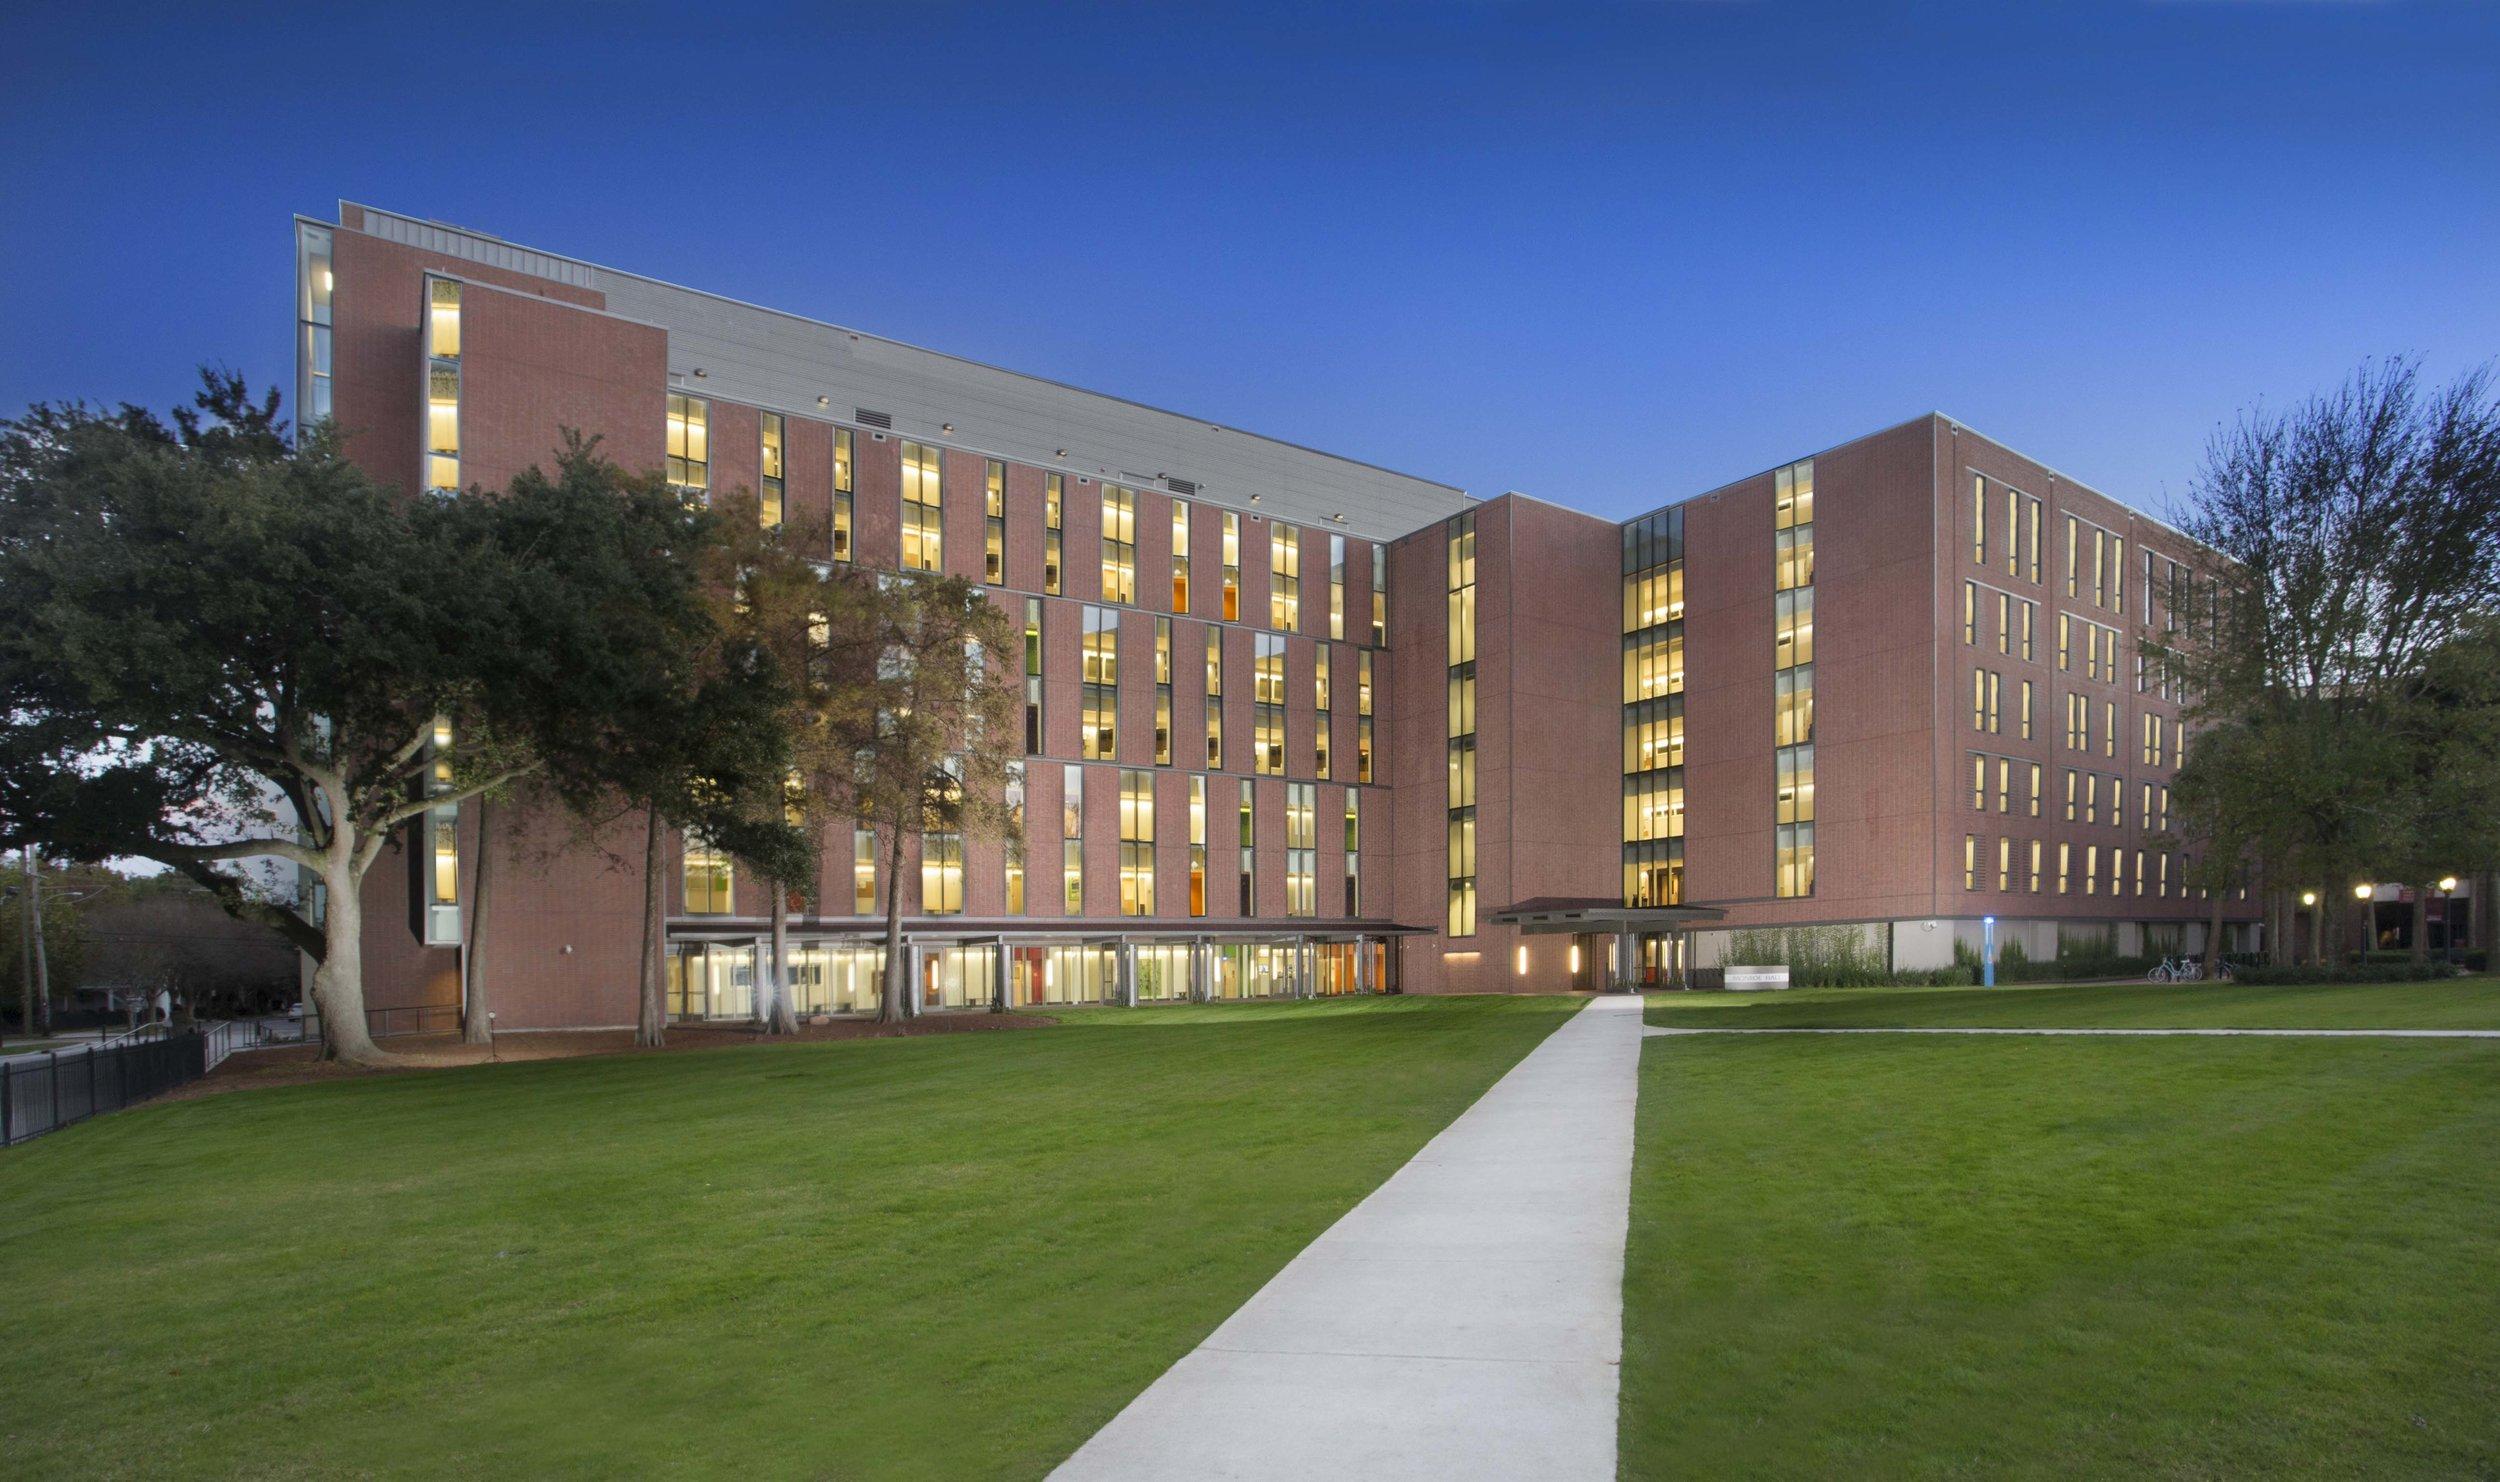 Loyola University Monroe Hall